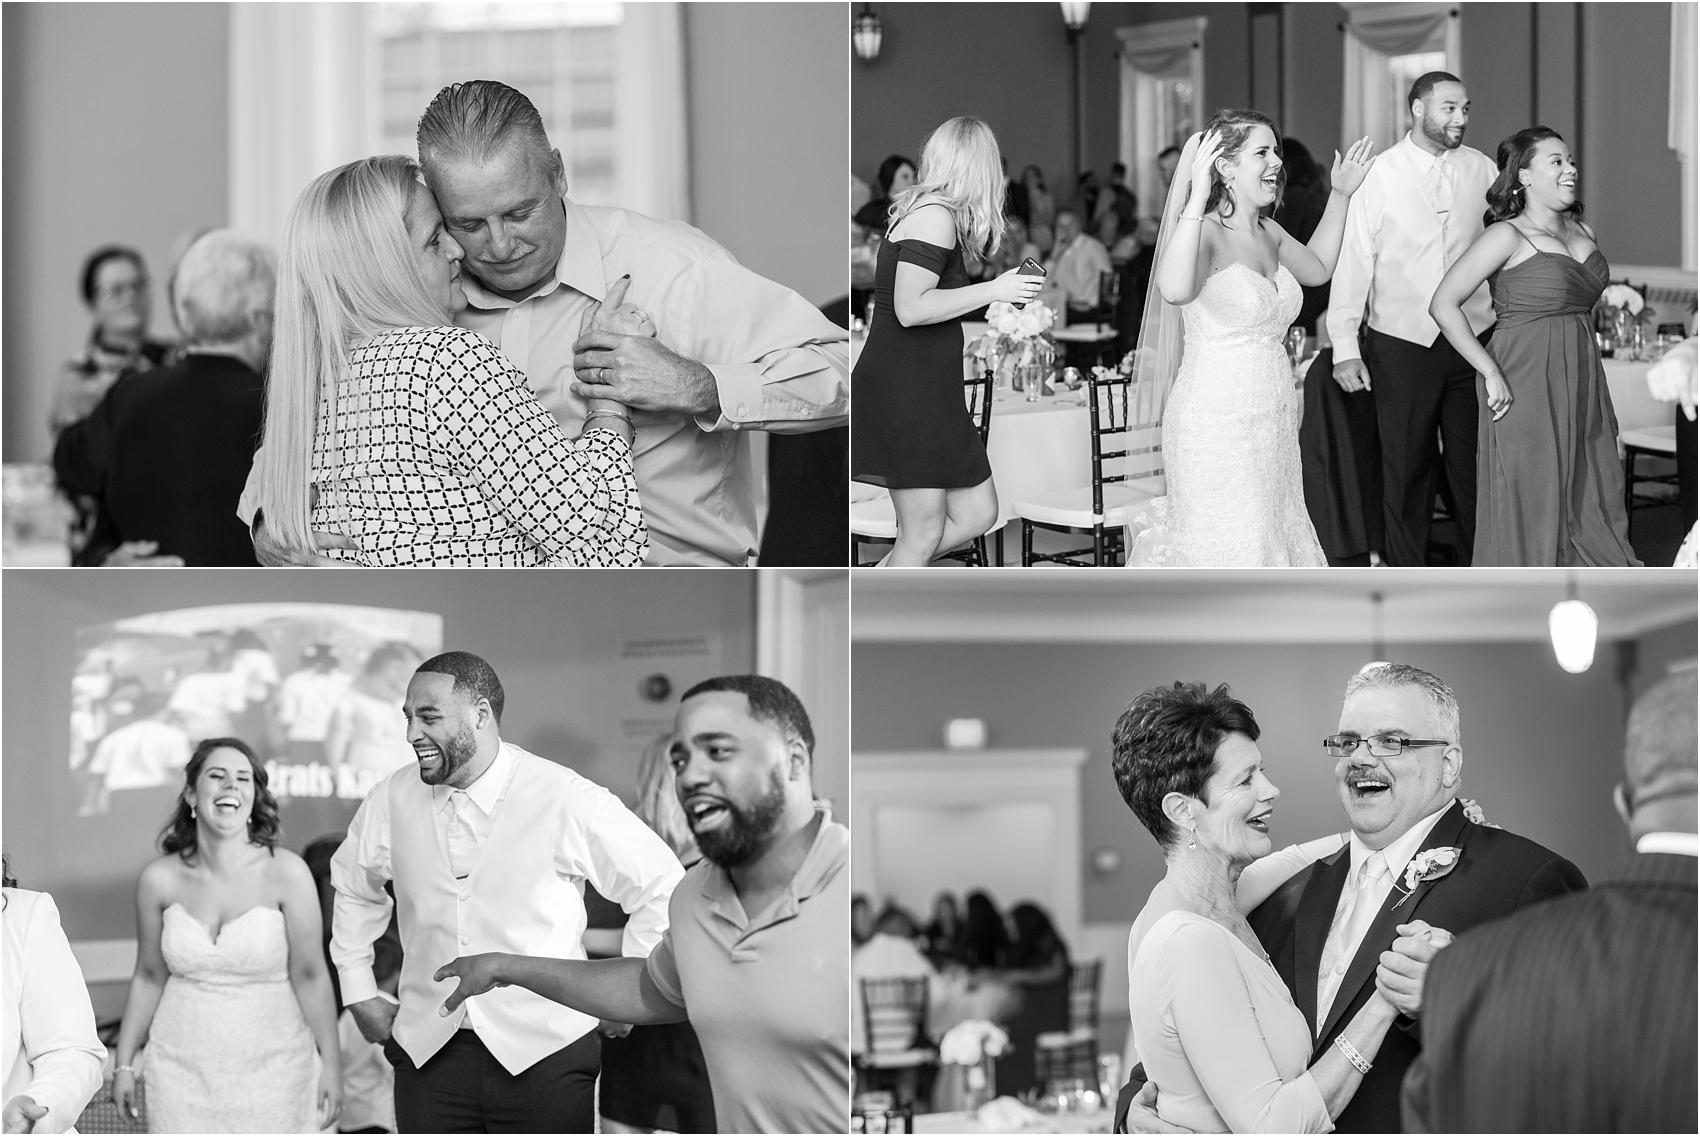 elegant-and-romantic-fall-wedding-photos-at-st-marys-catholic-church-in-monroe-michigan-by-courtney-carolyn-photography_0076.jpg